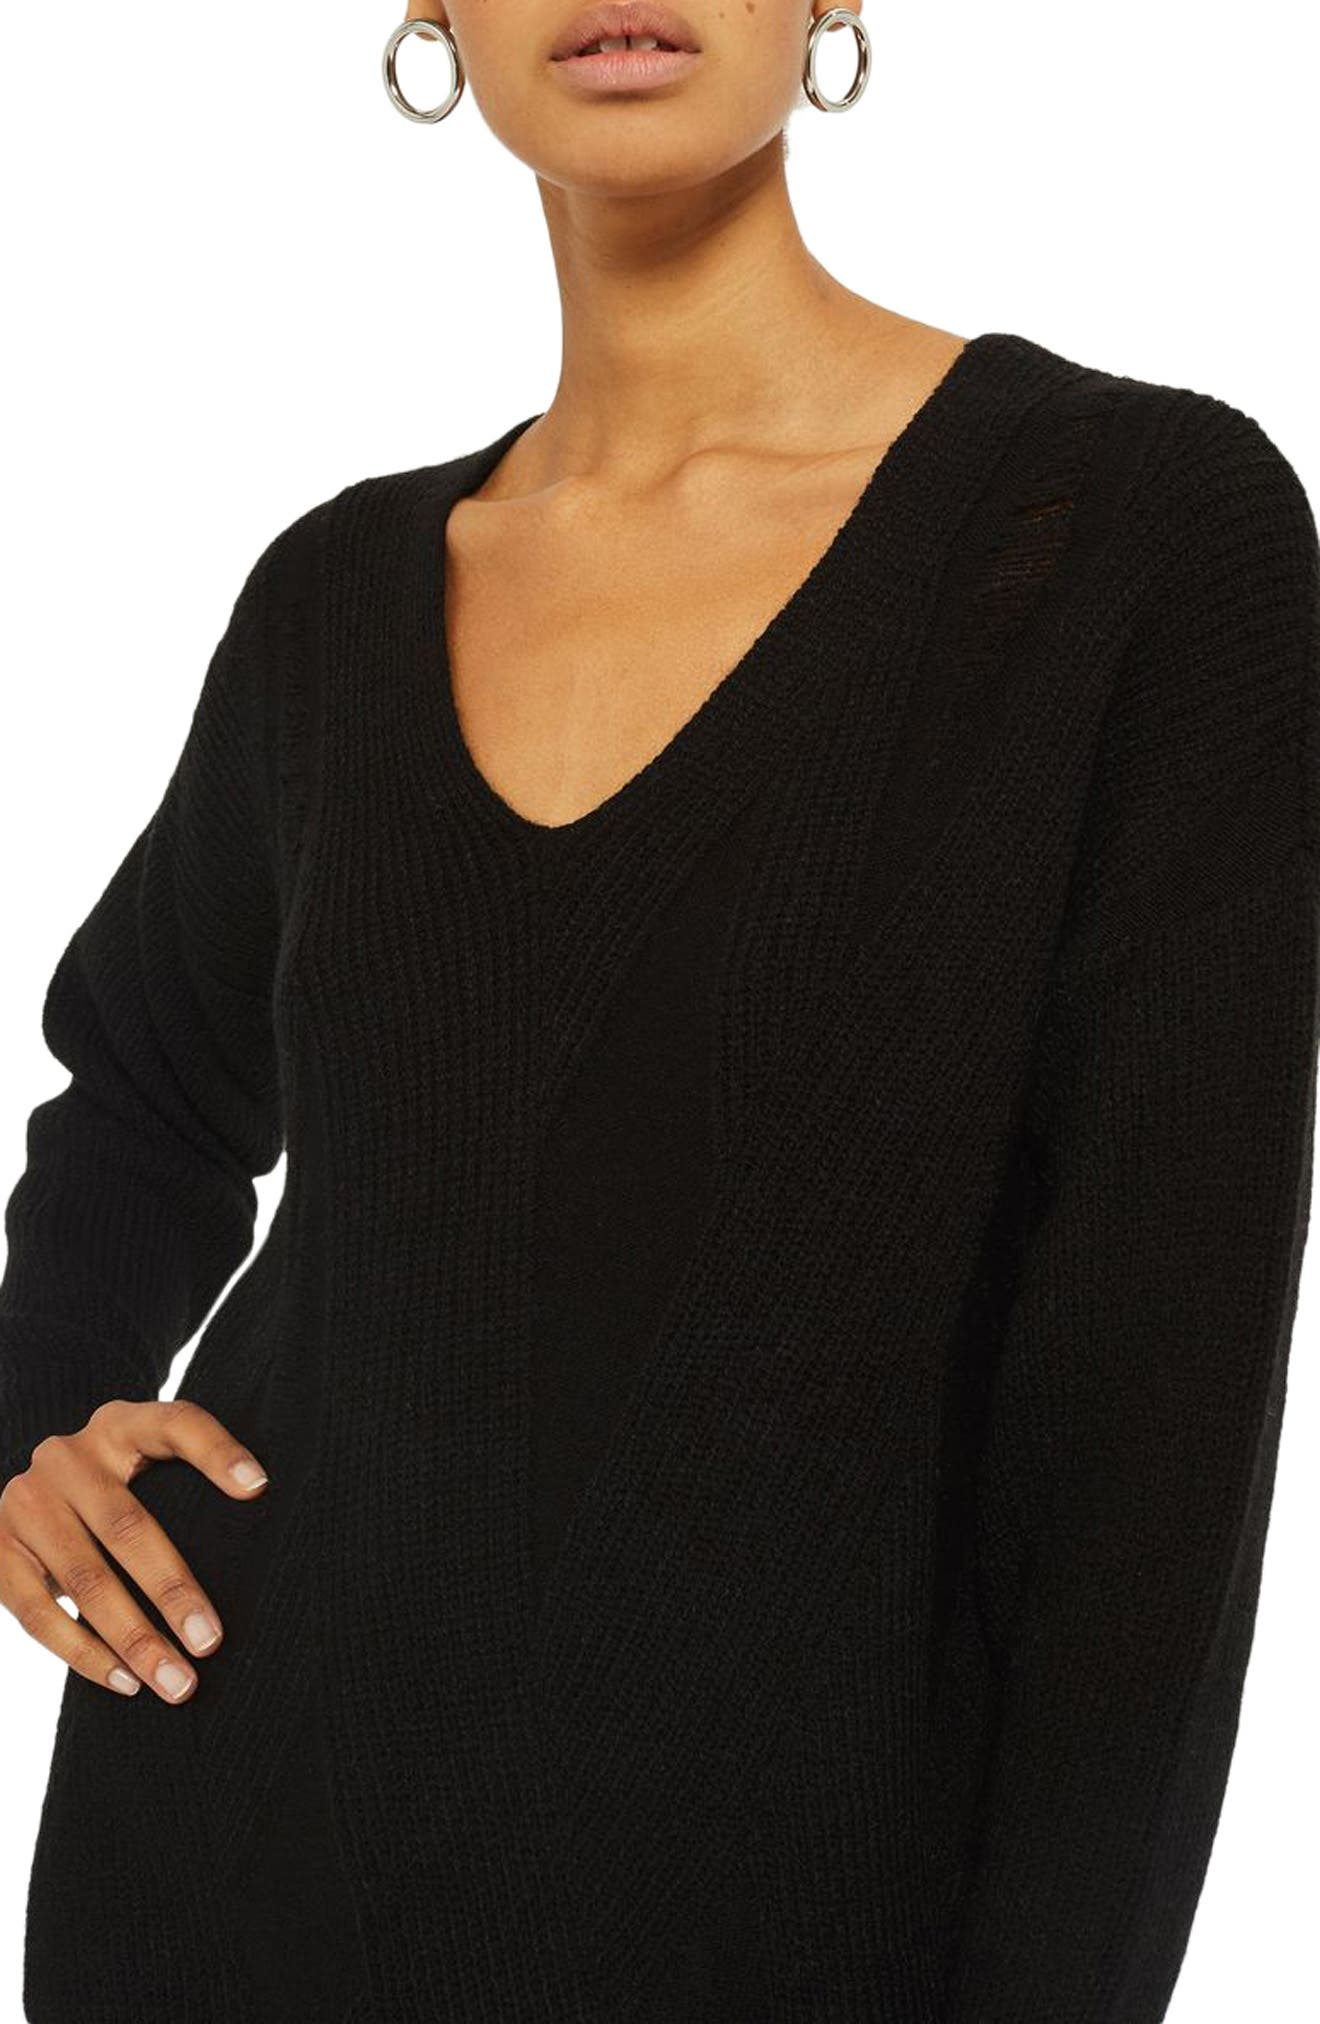 Ladder Stitch Sweater,                             Alternate thumbnail 3, color,                             Black